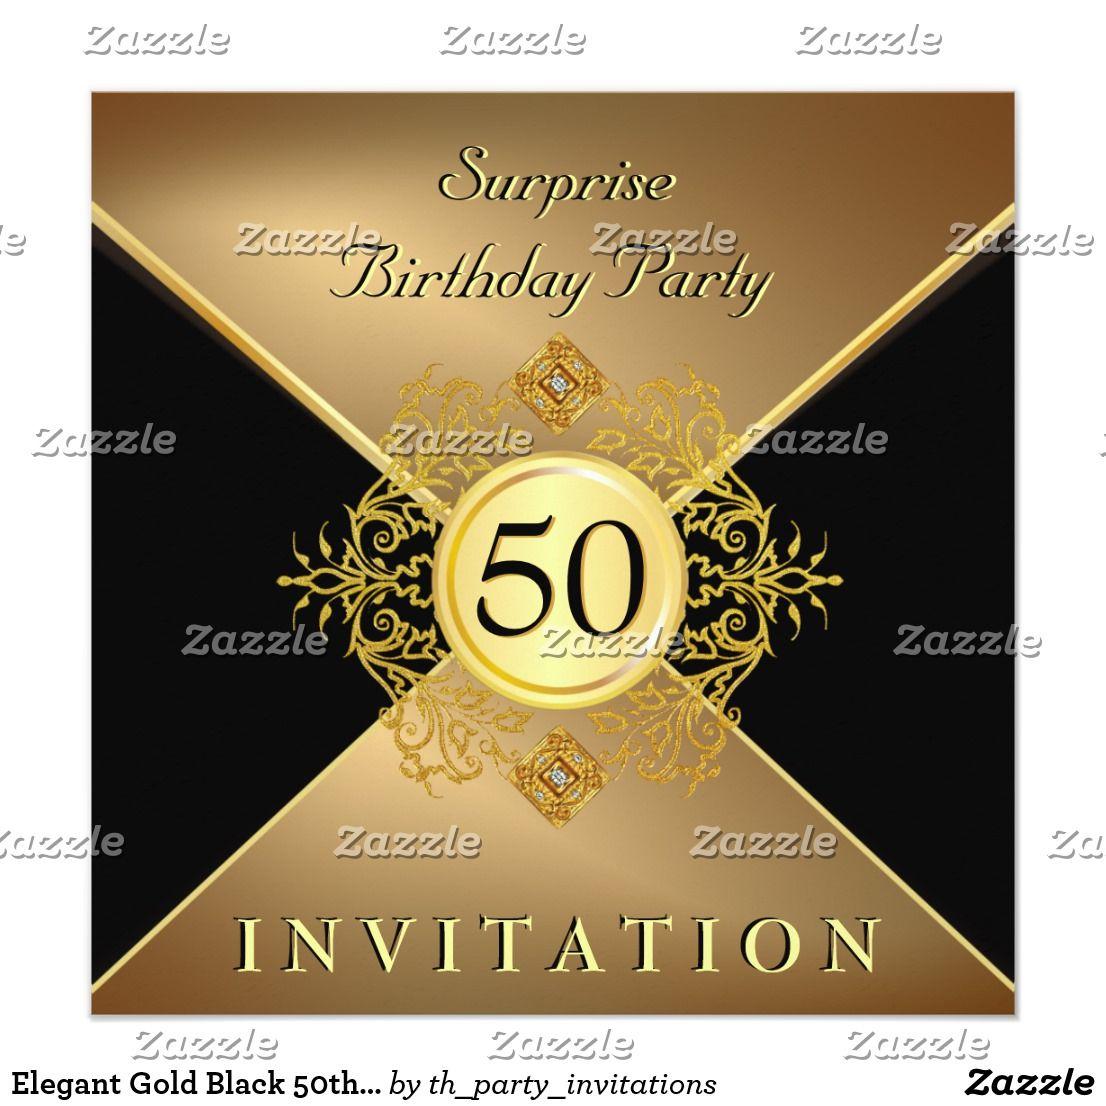 Elegant Gold Black 50th Birthday Surprise Party In Invitation   Zazzle.com    Surprise 50th birthday party, 50th birthday surprise, Birthday surprise  party